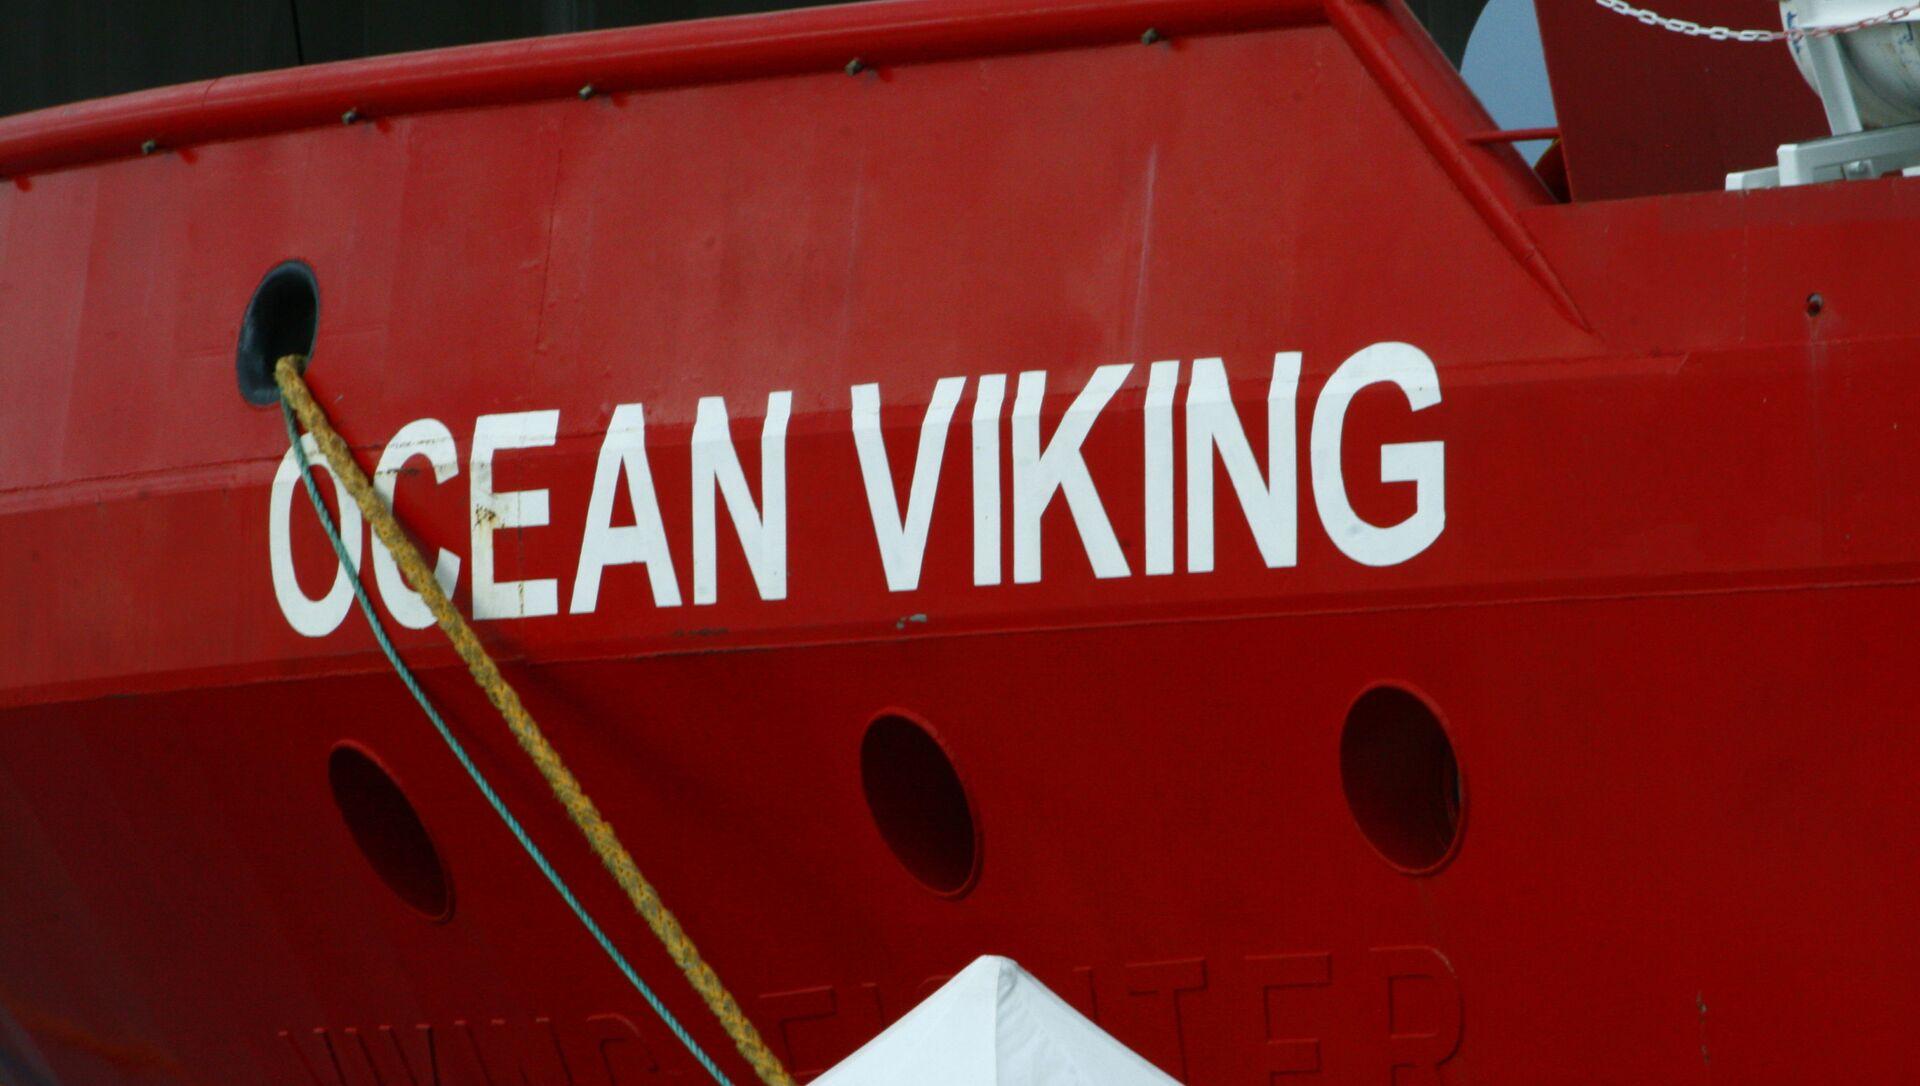 Lo sbarco della Ocean Viking a Messina - Sputnik Italia, 1920, 23.03.2021